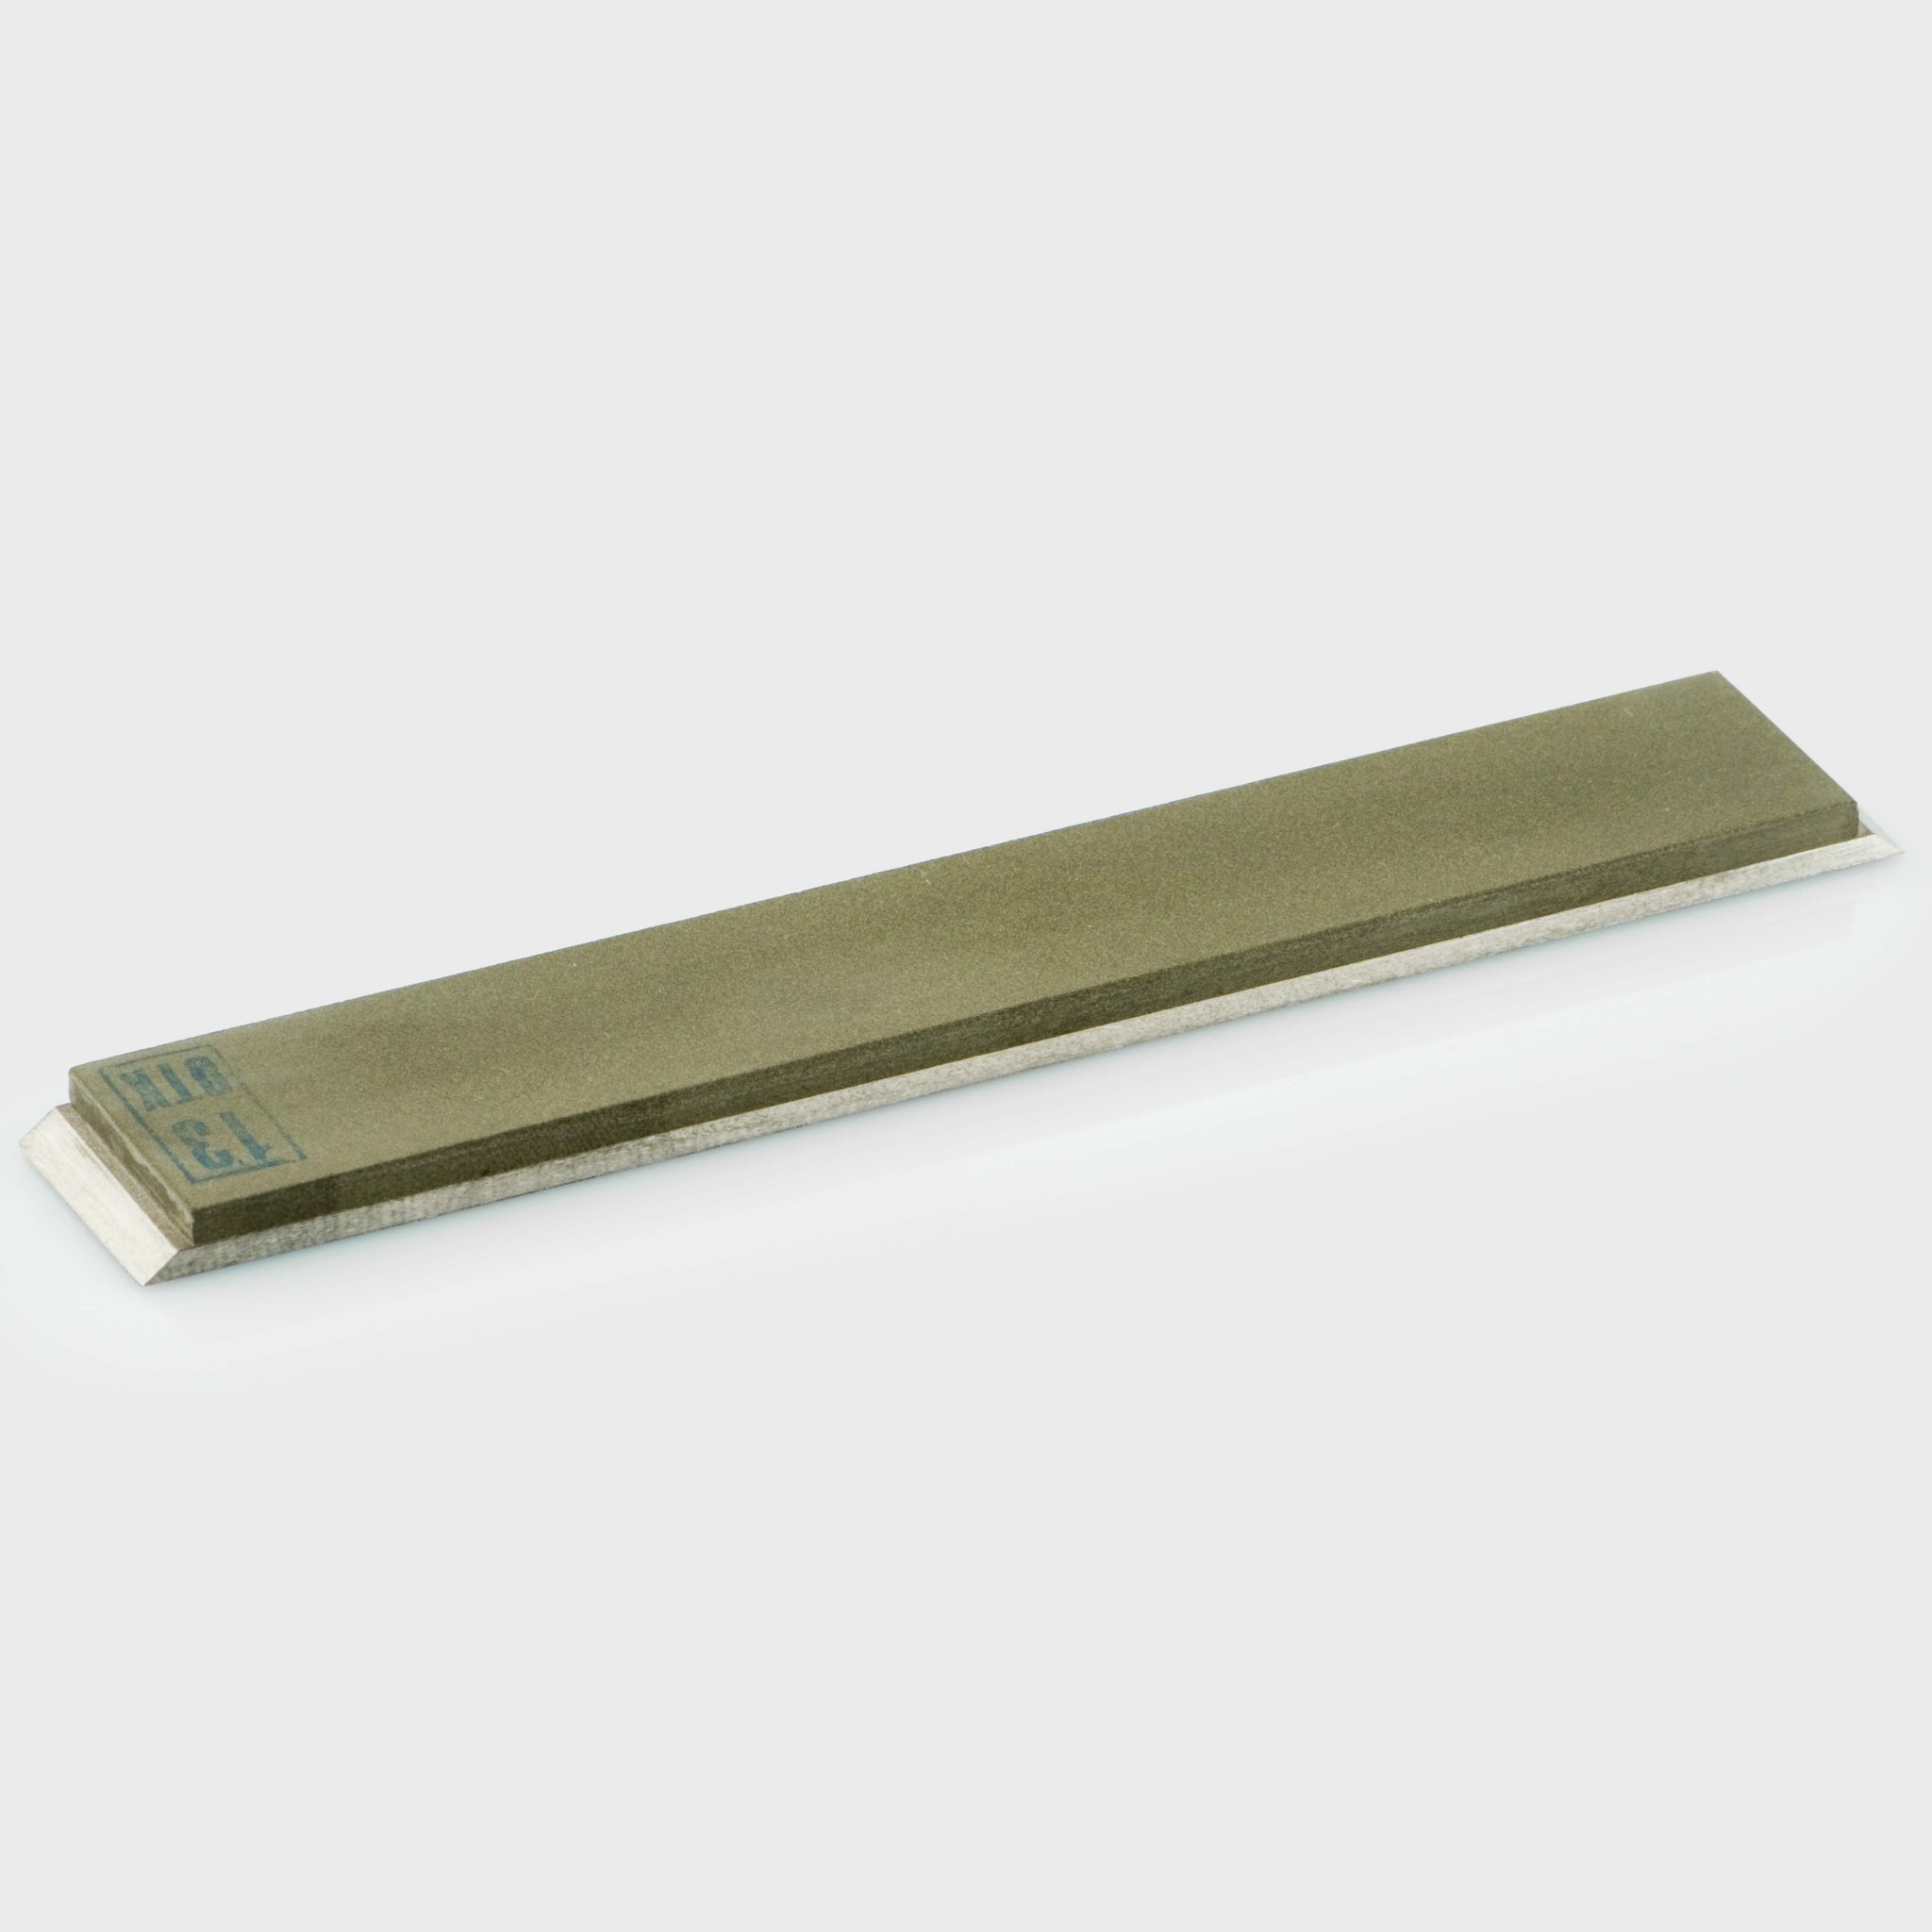 150х25х6 мм для Apex Edge Pro, ЖУК Алмазный брусок 150х25х6 100/80 100% IMGP2750_copy.jpg